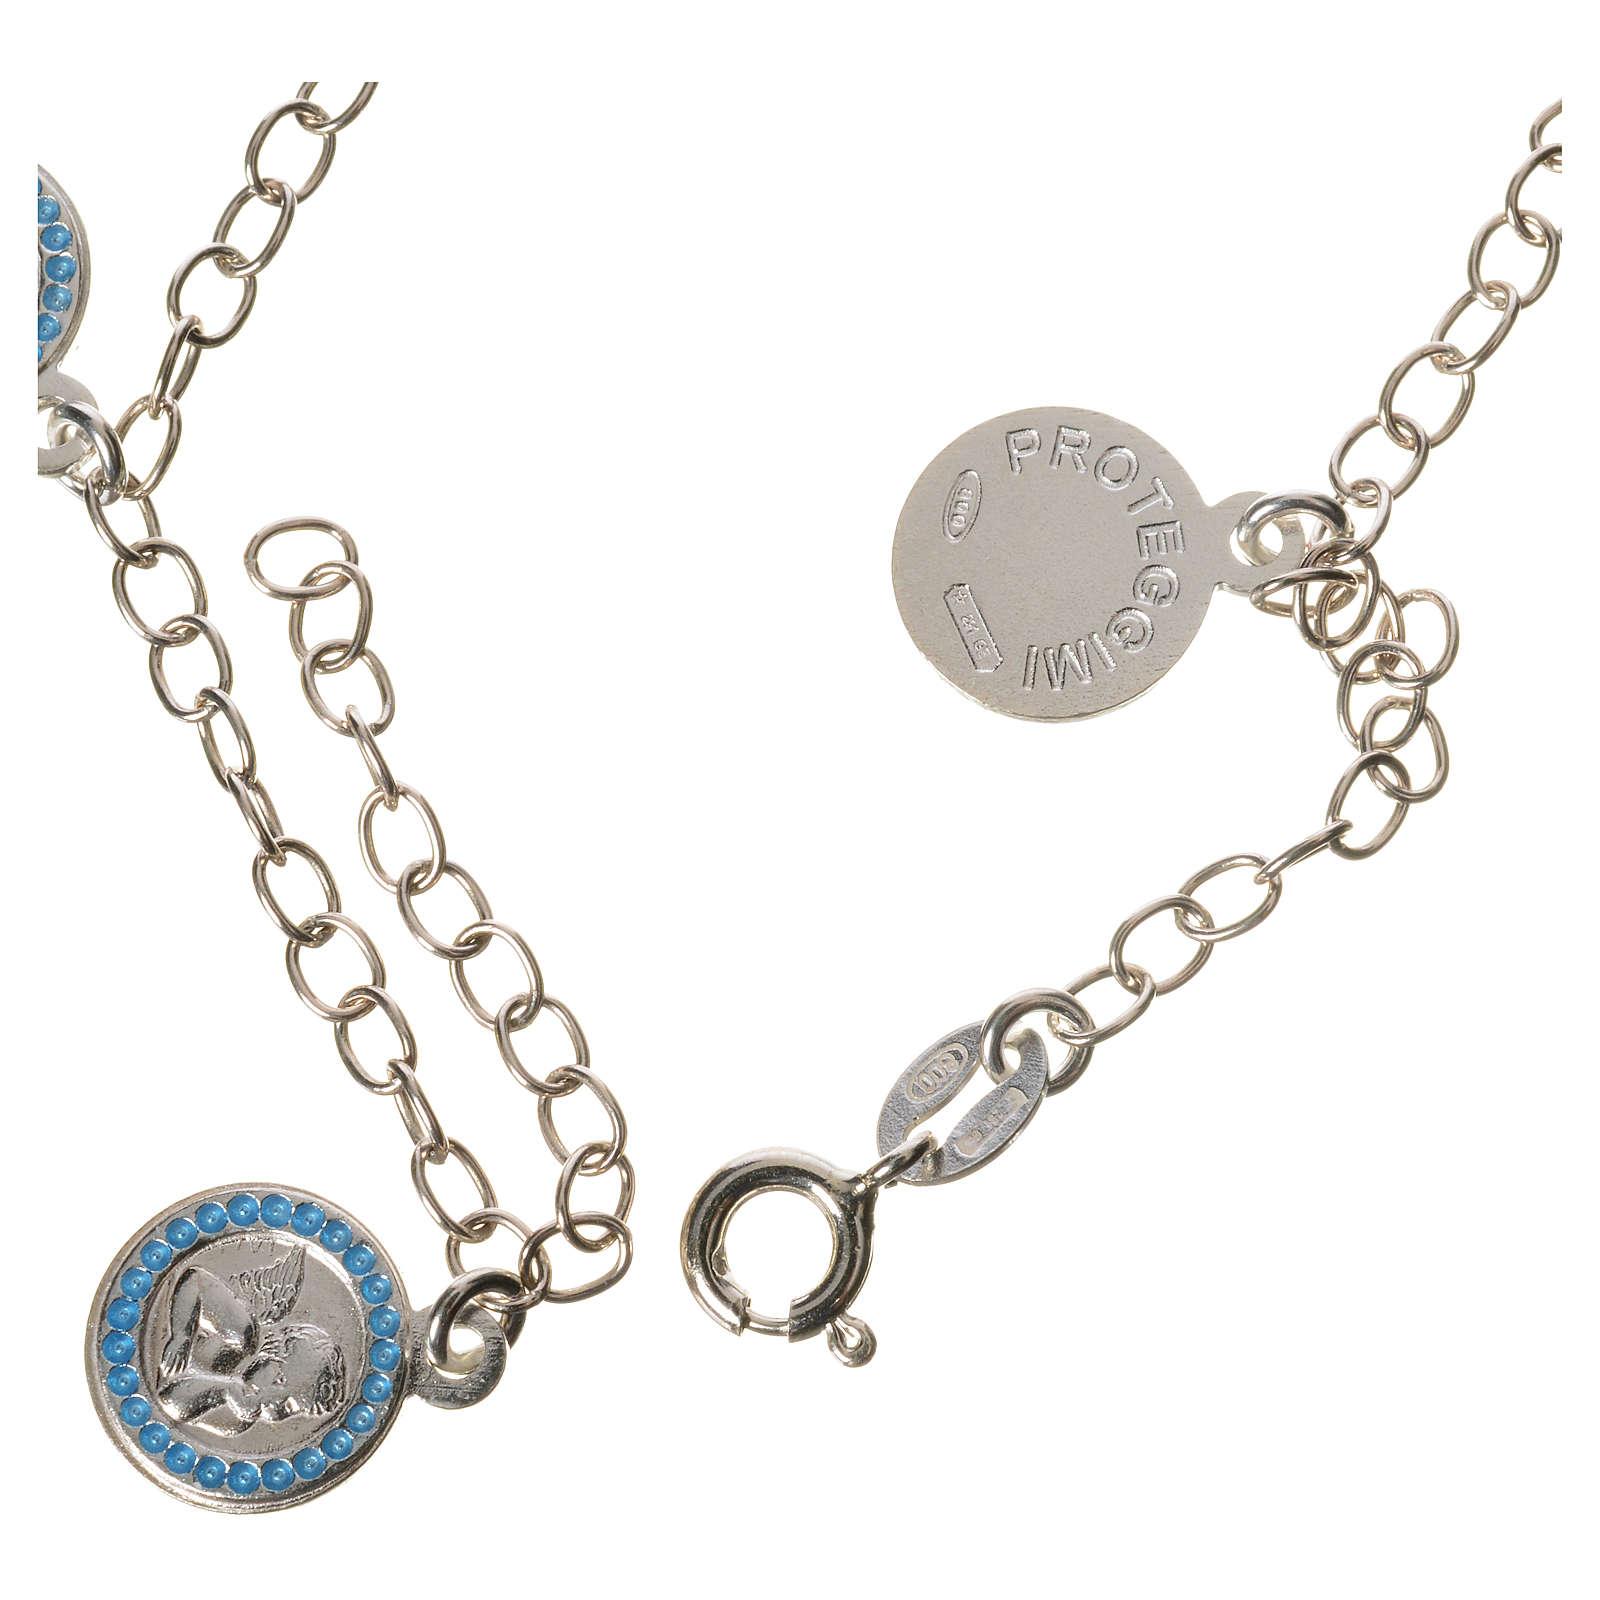 Bracelet in 800 silver with Guardian Angel medal, light blue 4